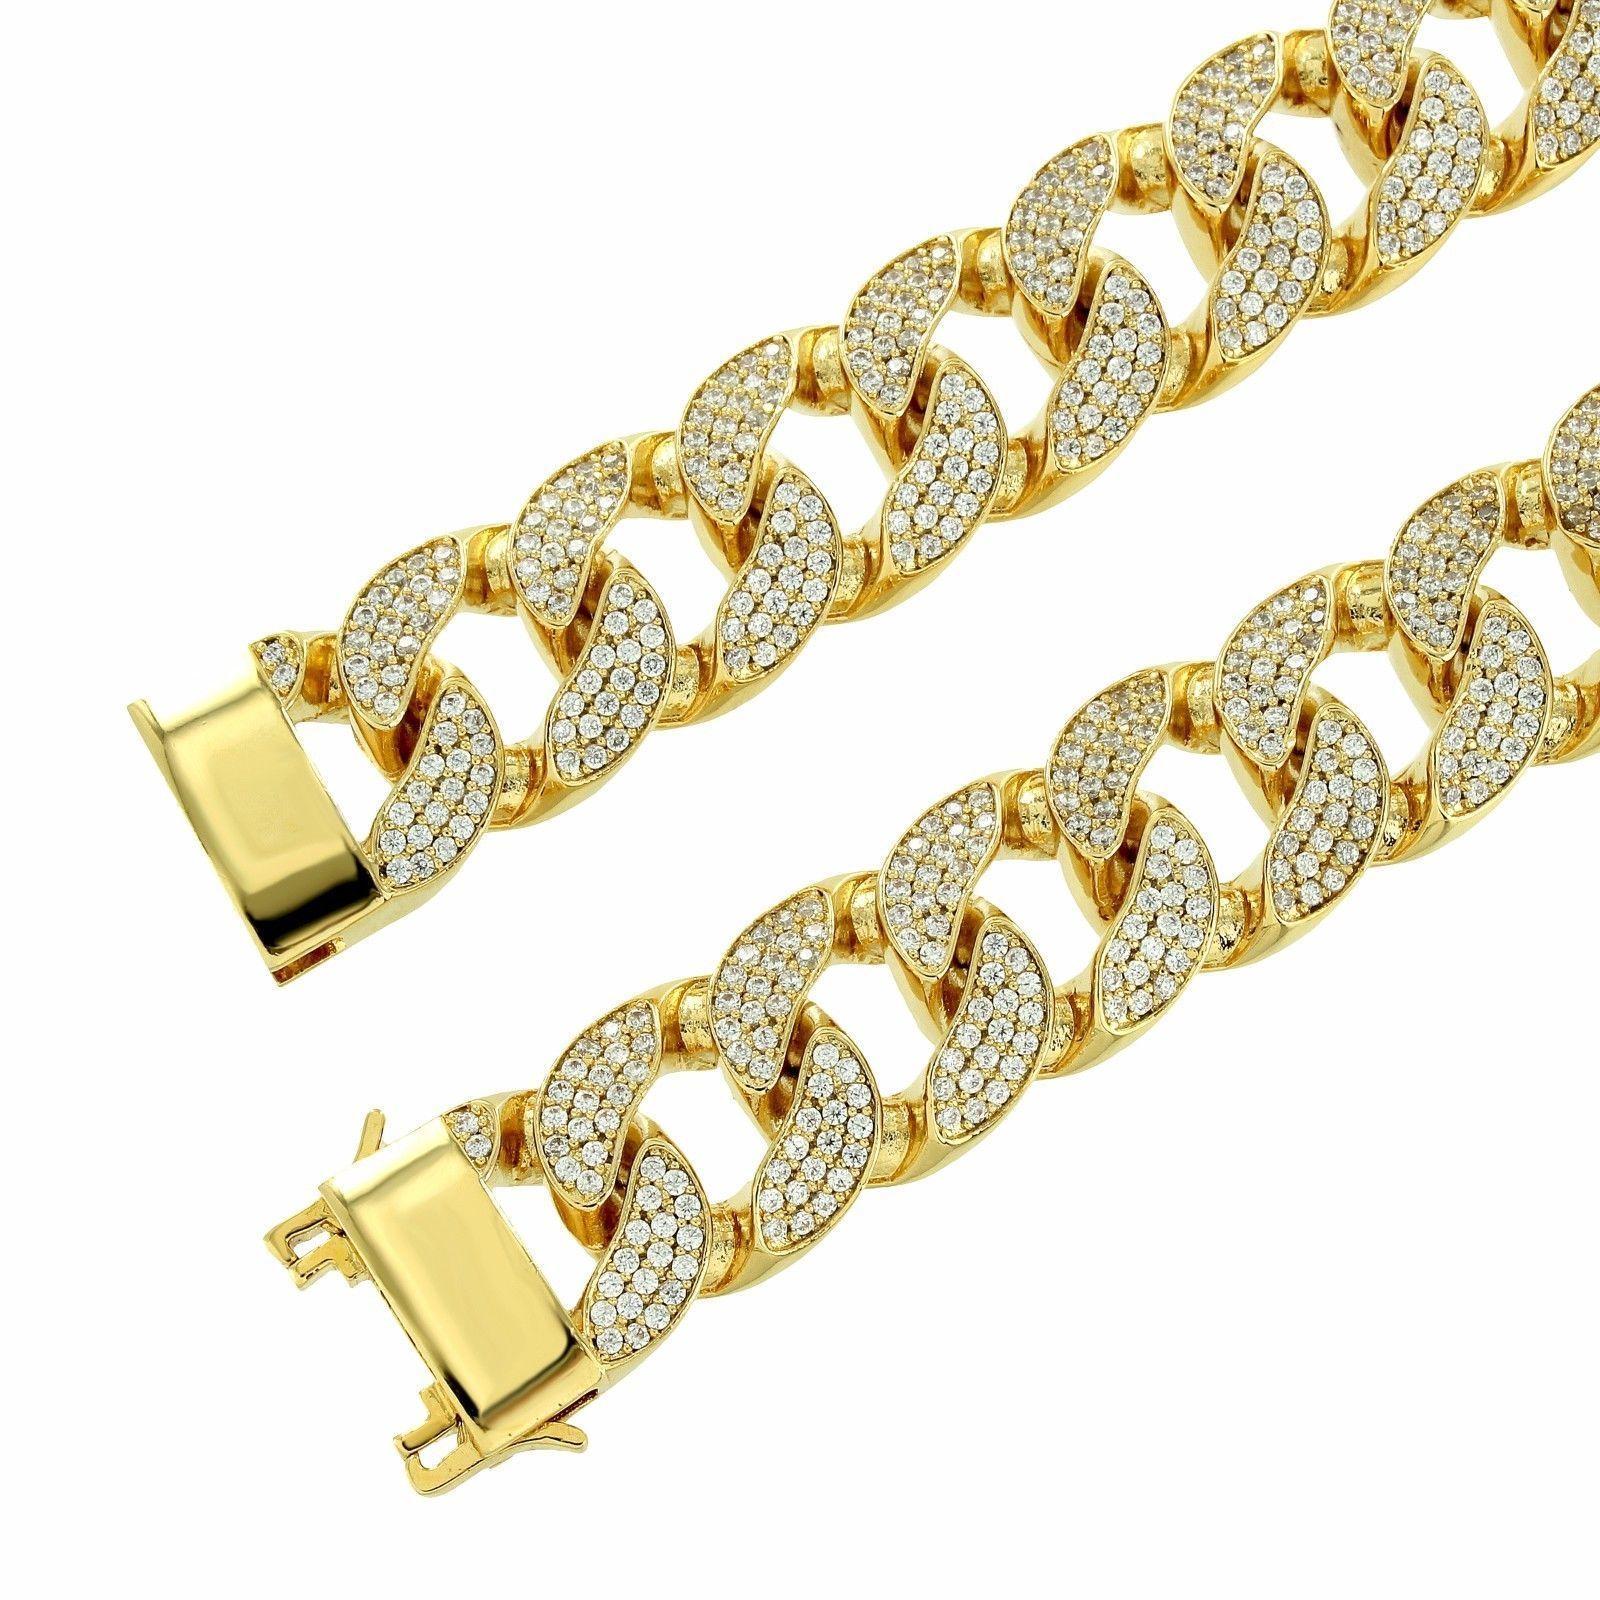 14K Yellow Gold Fn 10Ct D/VVS1 Diamonds Tennis Chain Necklace 925 Silver